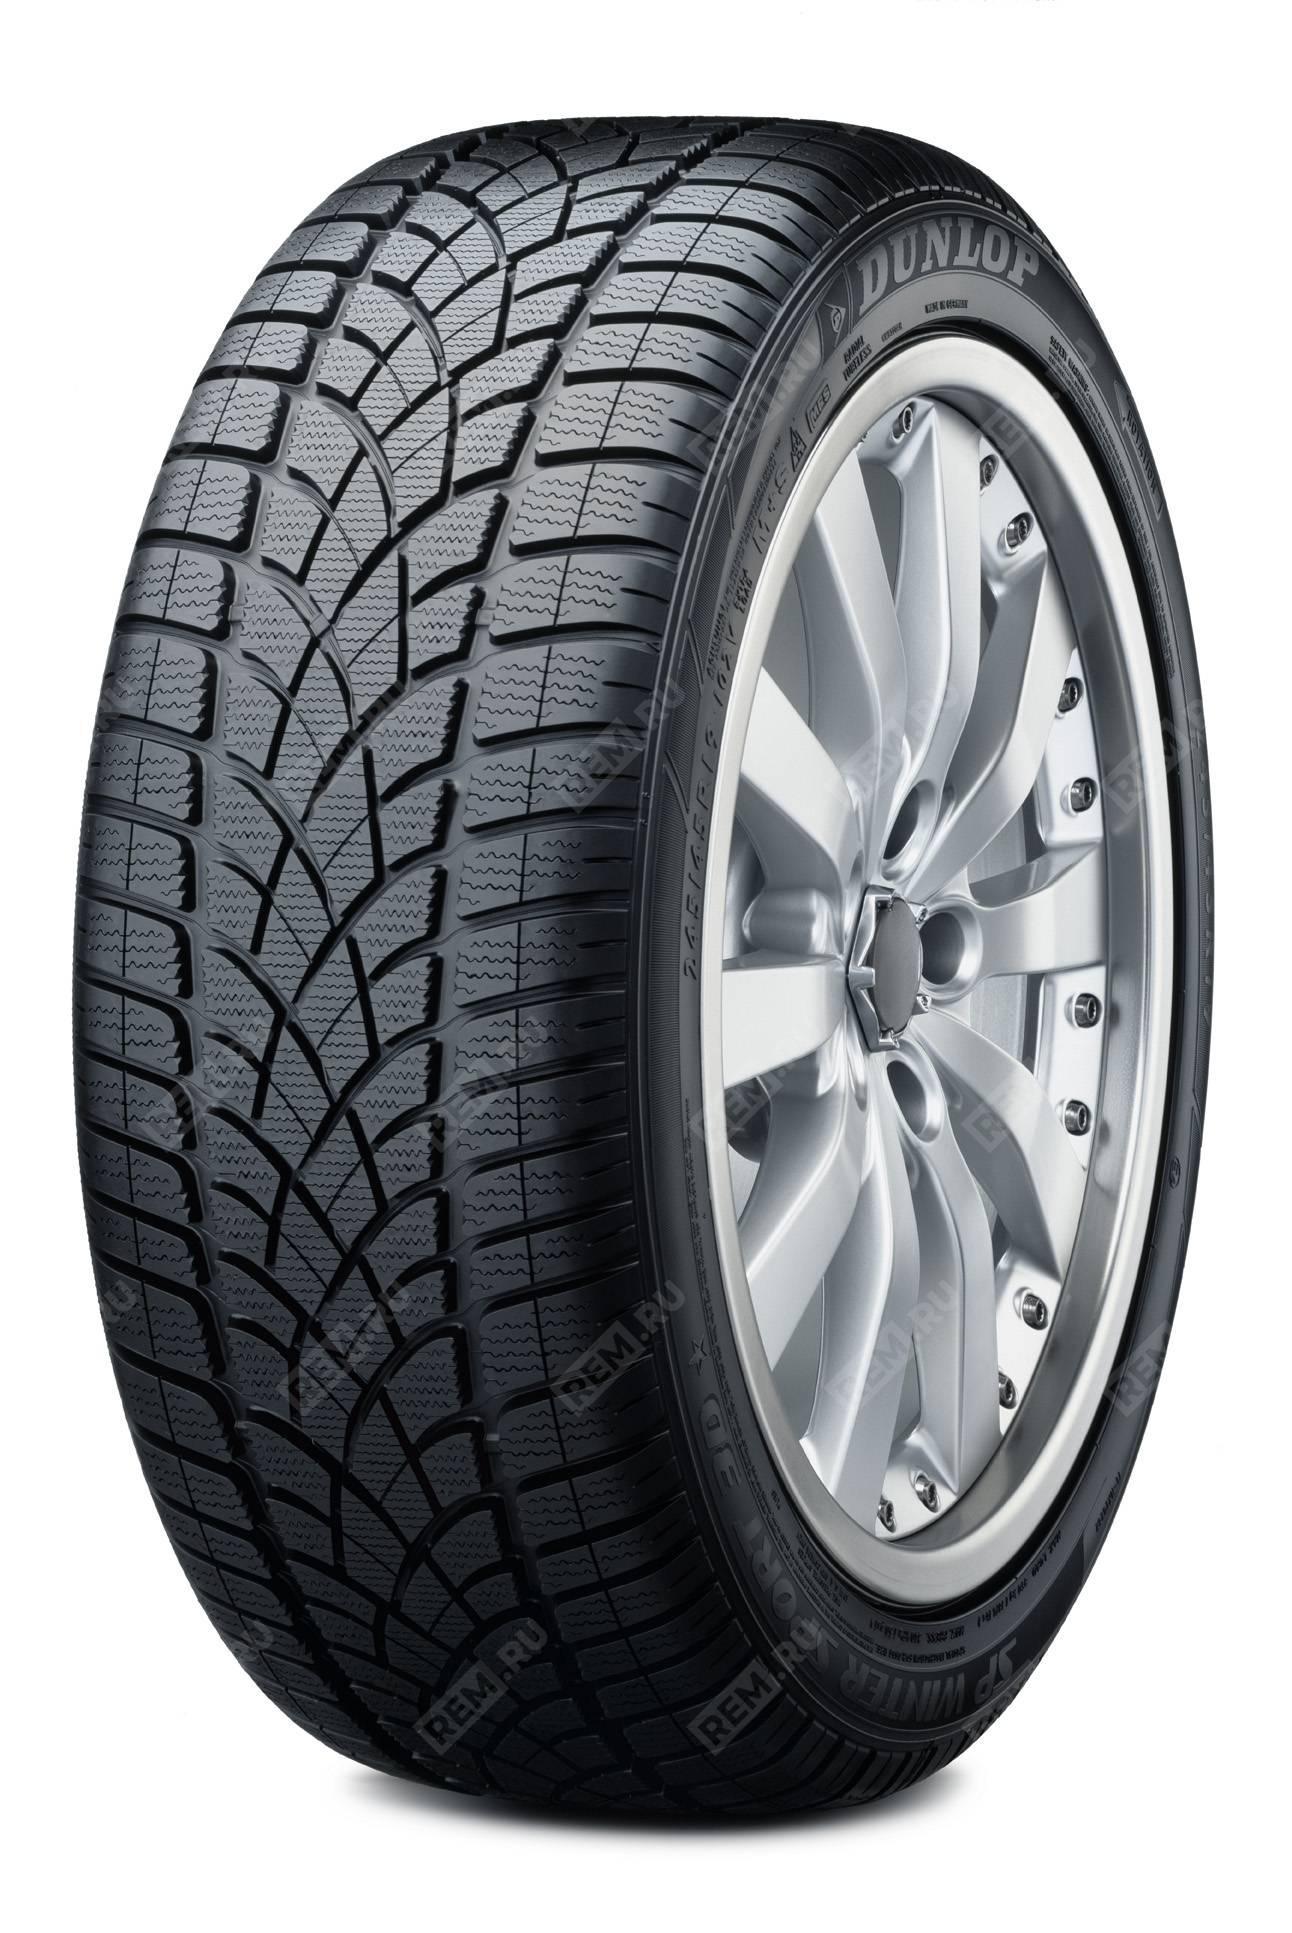 Фото Автошина, XL, зимняя, Dunlop SP Winter Sport 3D, 245/45R19 102V RunFlat 36120445257